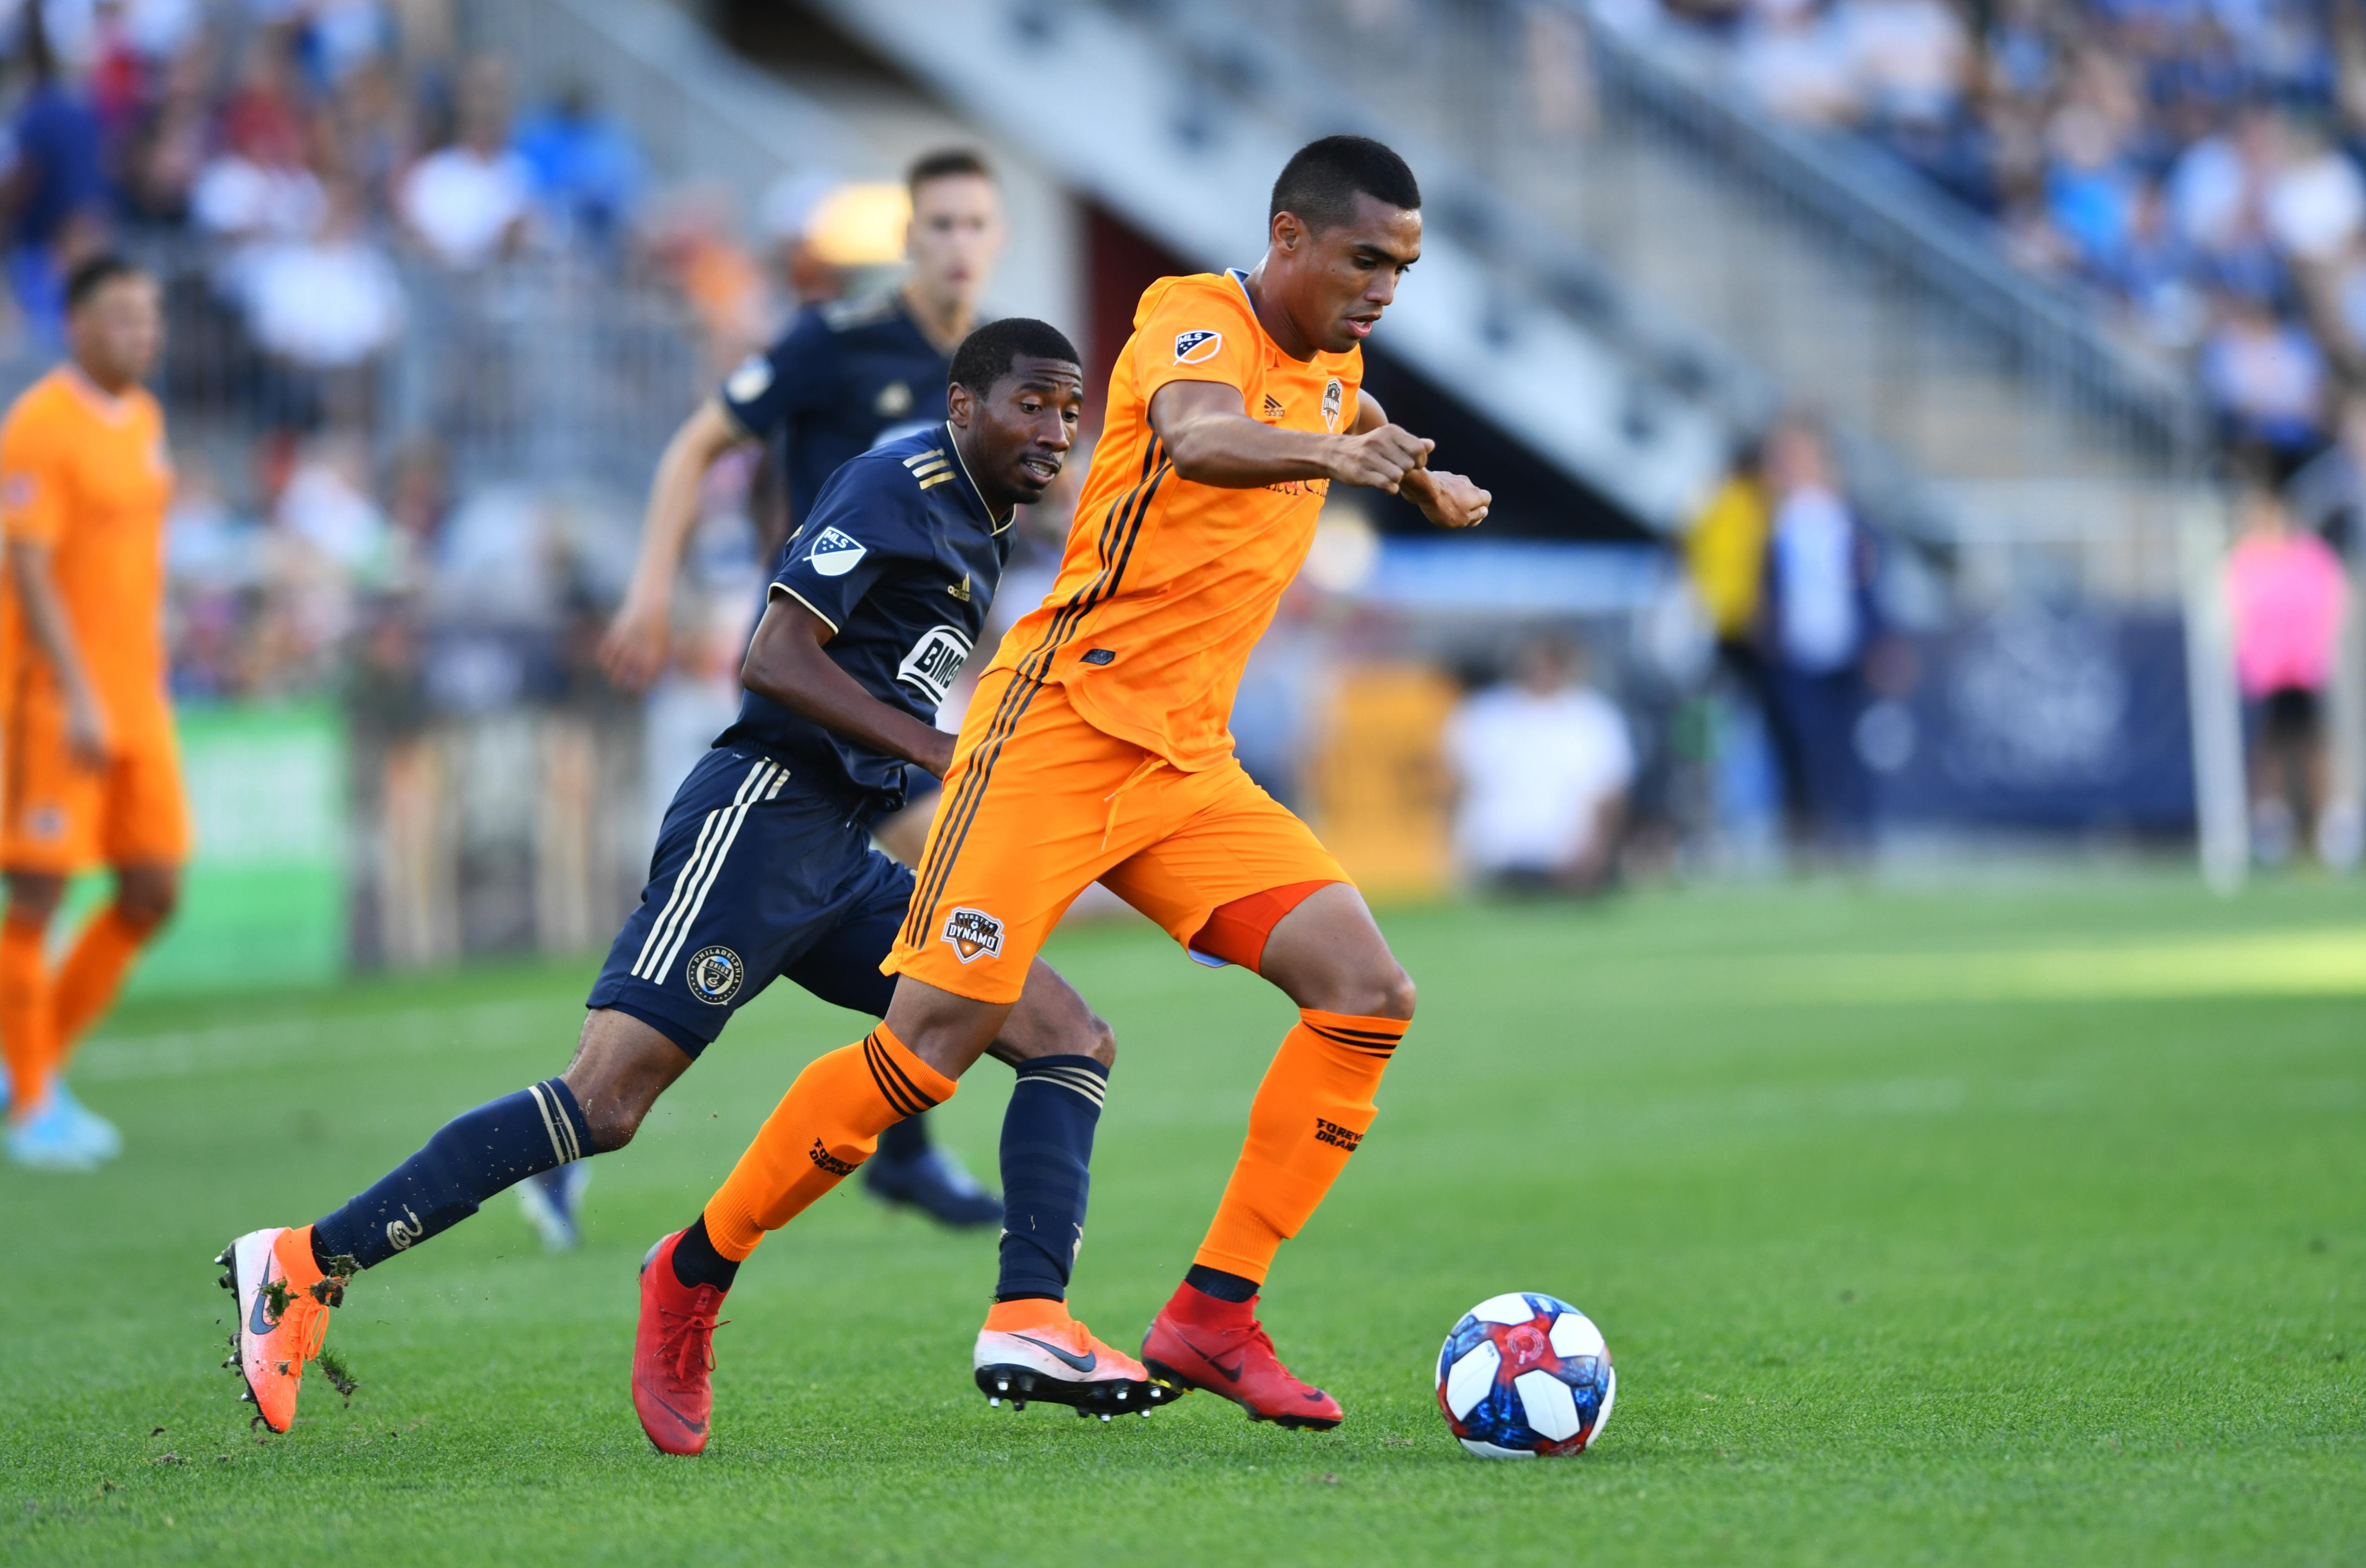 SOCCER: AUG 11 MLS - Houston Dynamo at Philadelphia Union